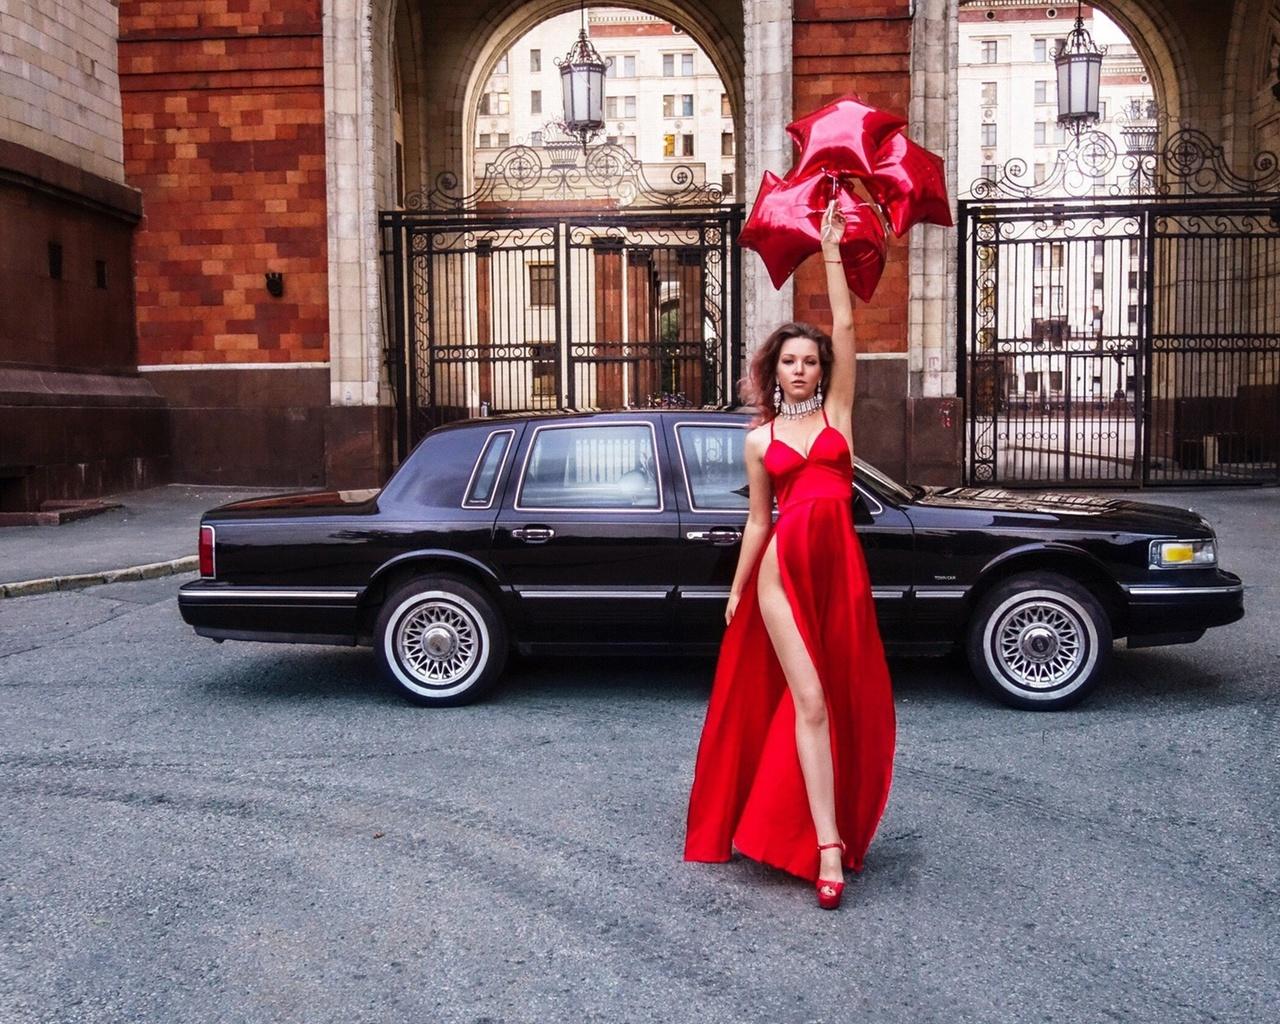 татьяна федорищева, город, авто, девушка